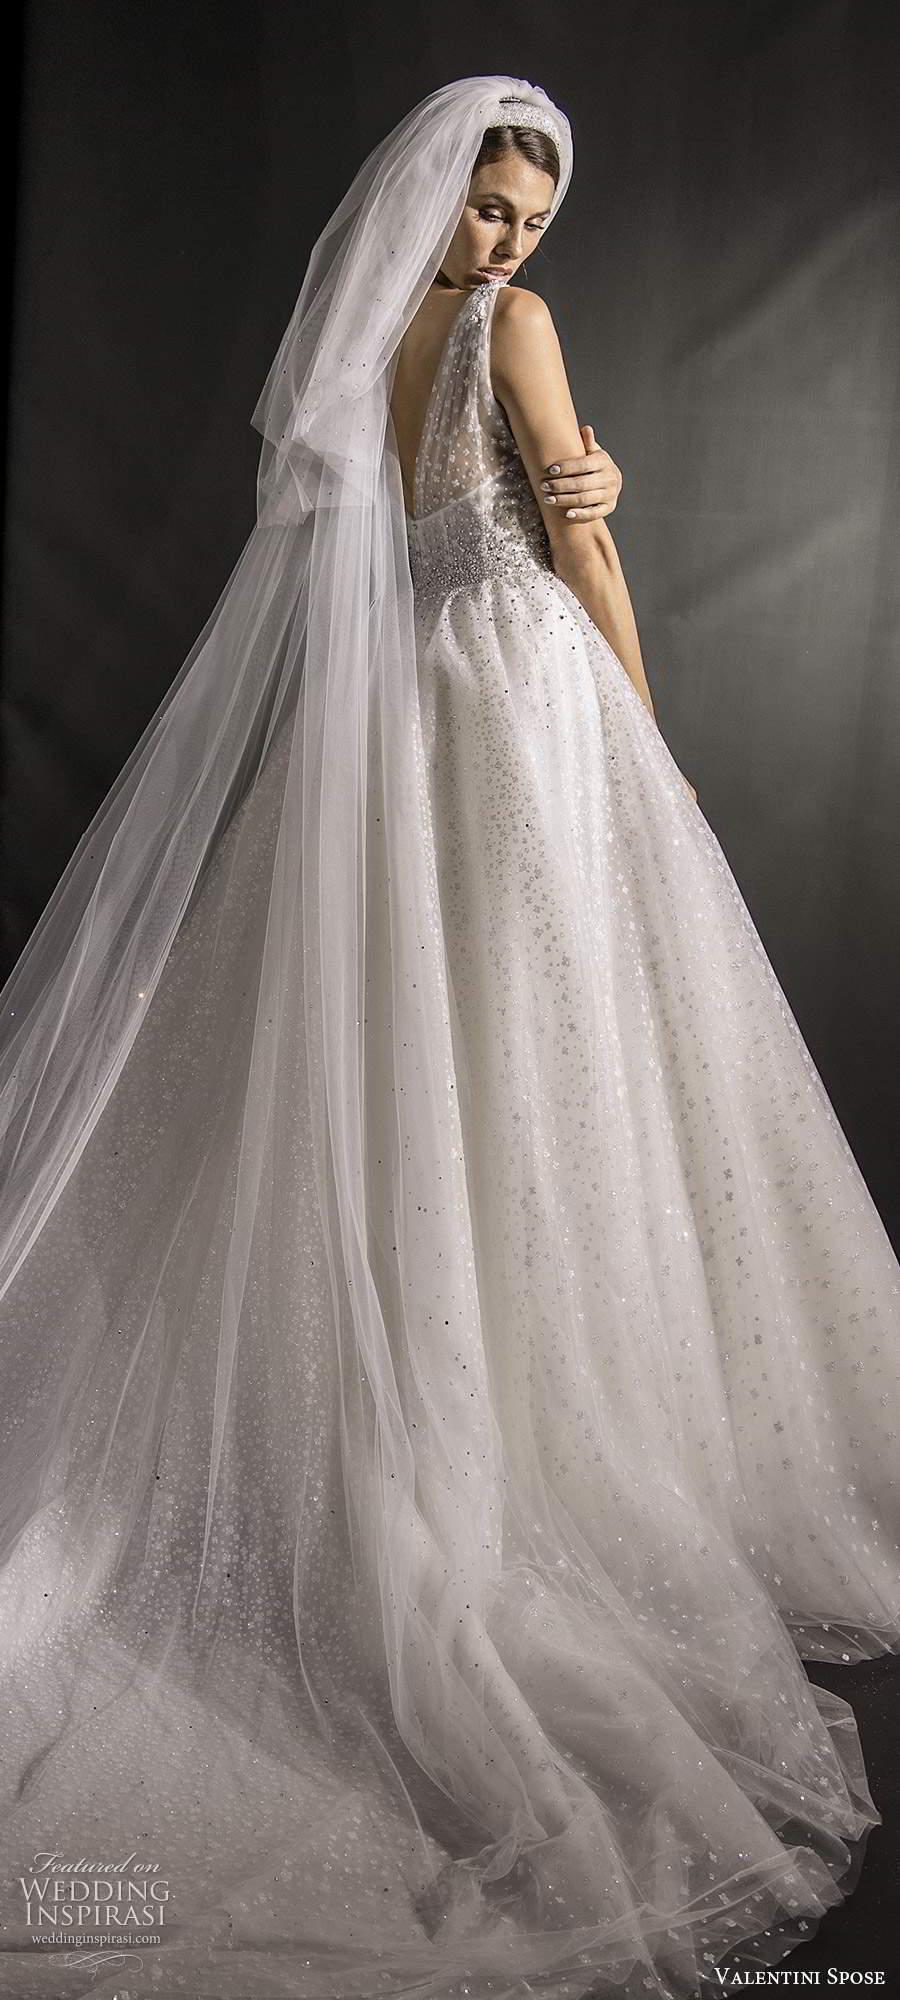 valentini spose fall 2020 bridal sleeveless illusion straps v neckline fully embellished glitzy a line ball gown wedding dress chapel train (1) bv